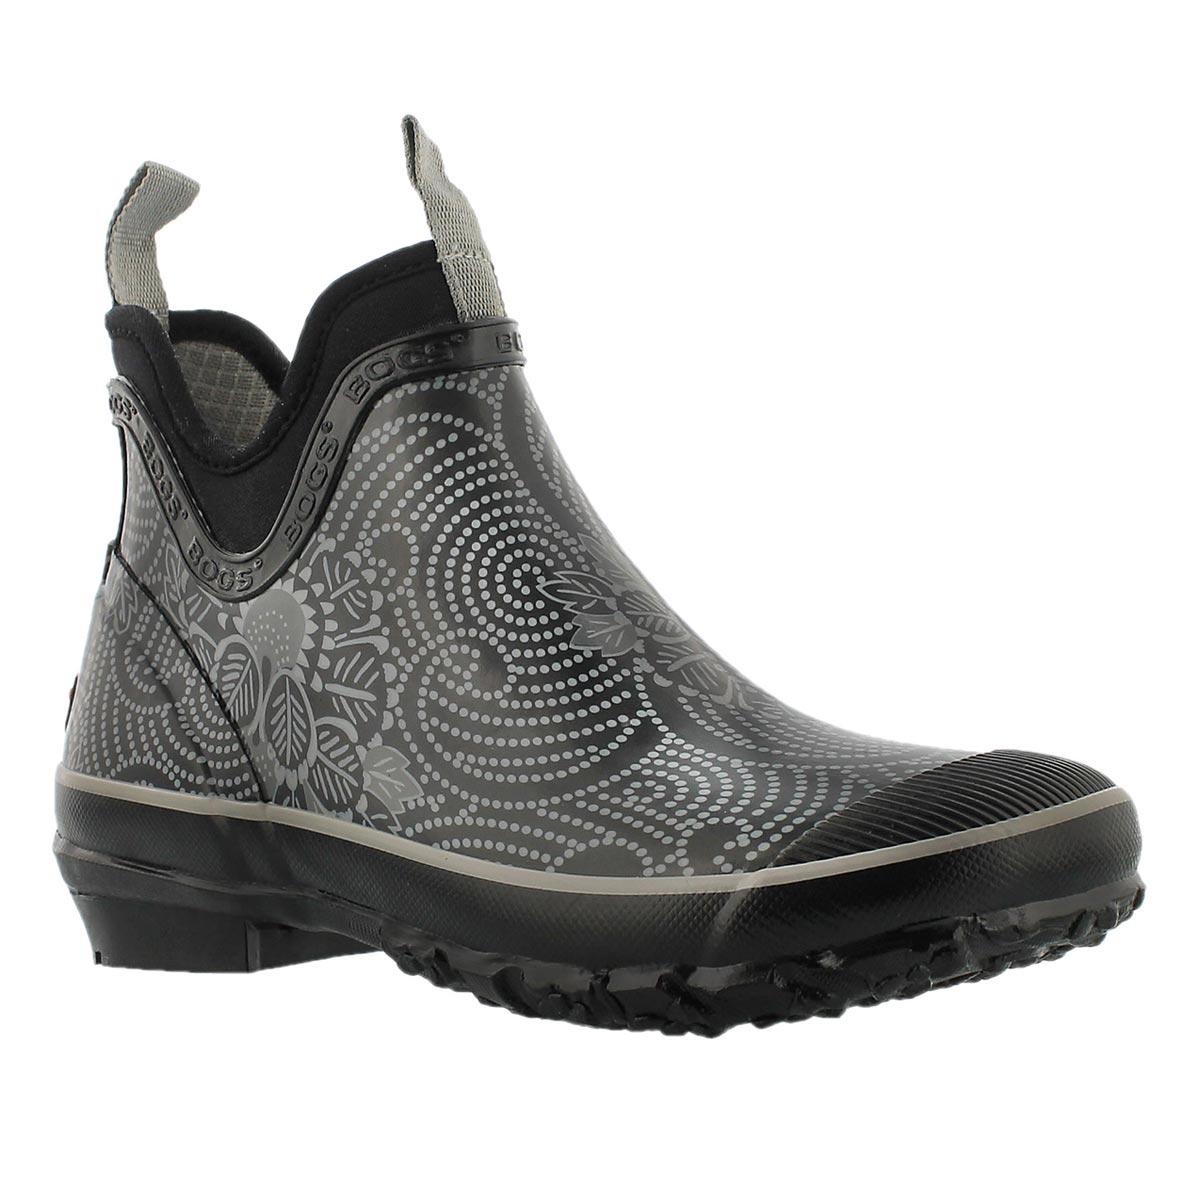 Lds Harper Batik black chelsea rain boot